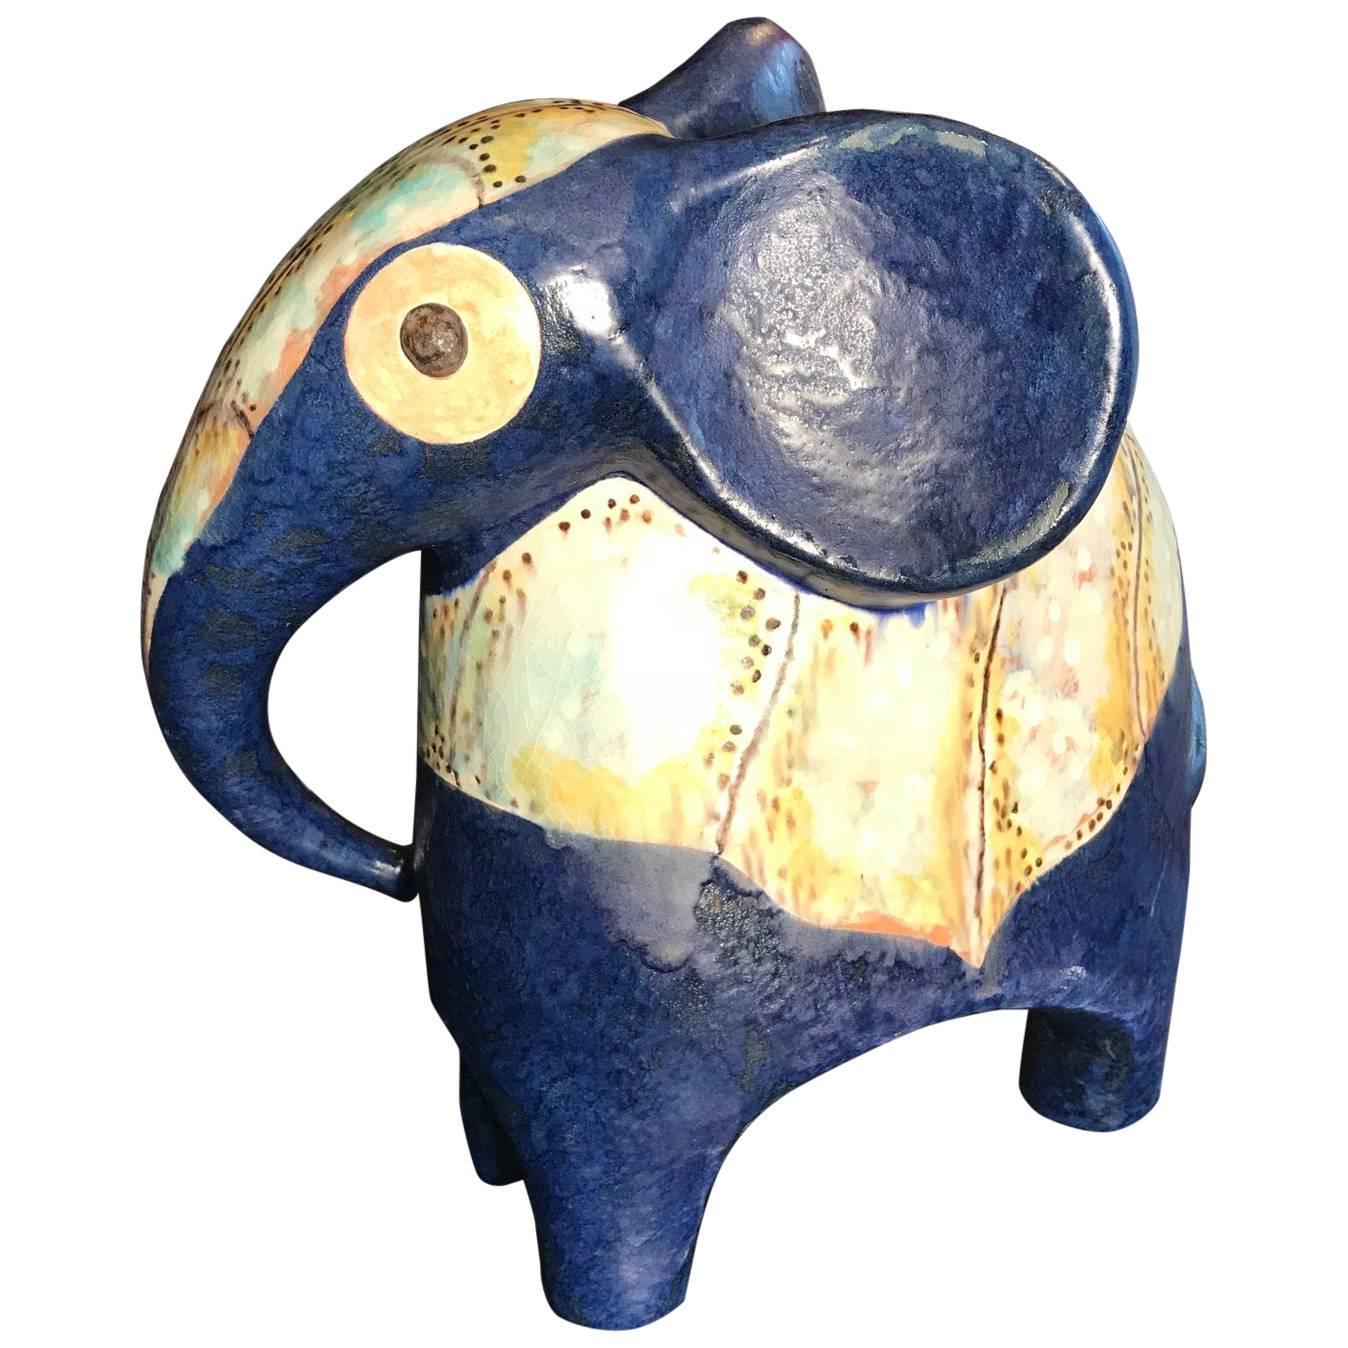 Stunning Handmade Hand-Painted Elephant, Master Artisan Eva Fritz-Lindner